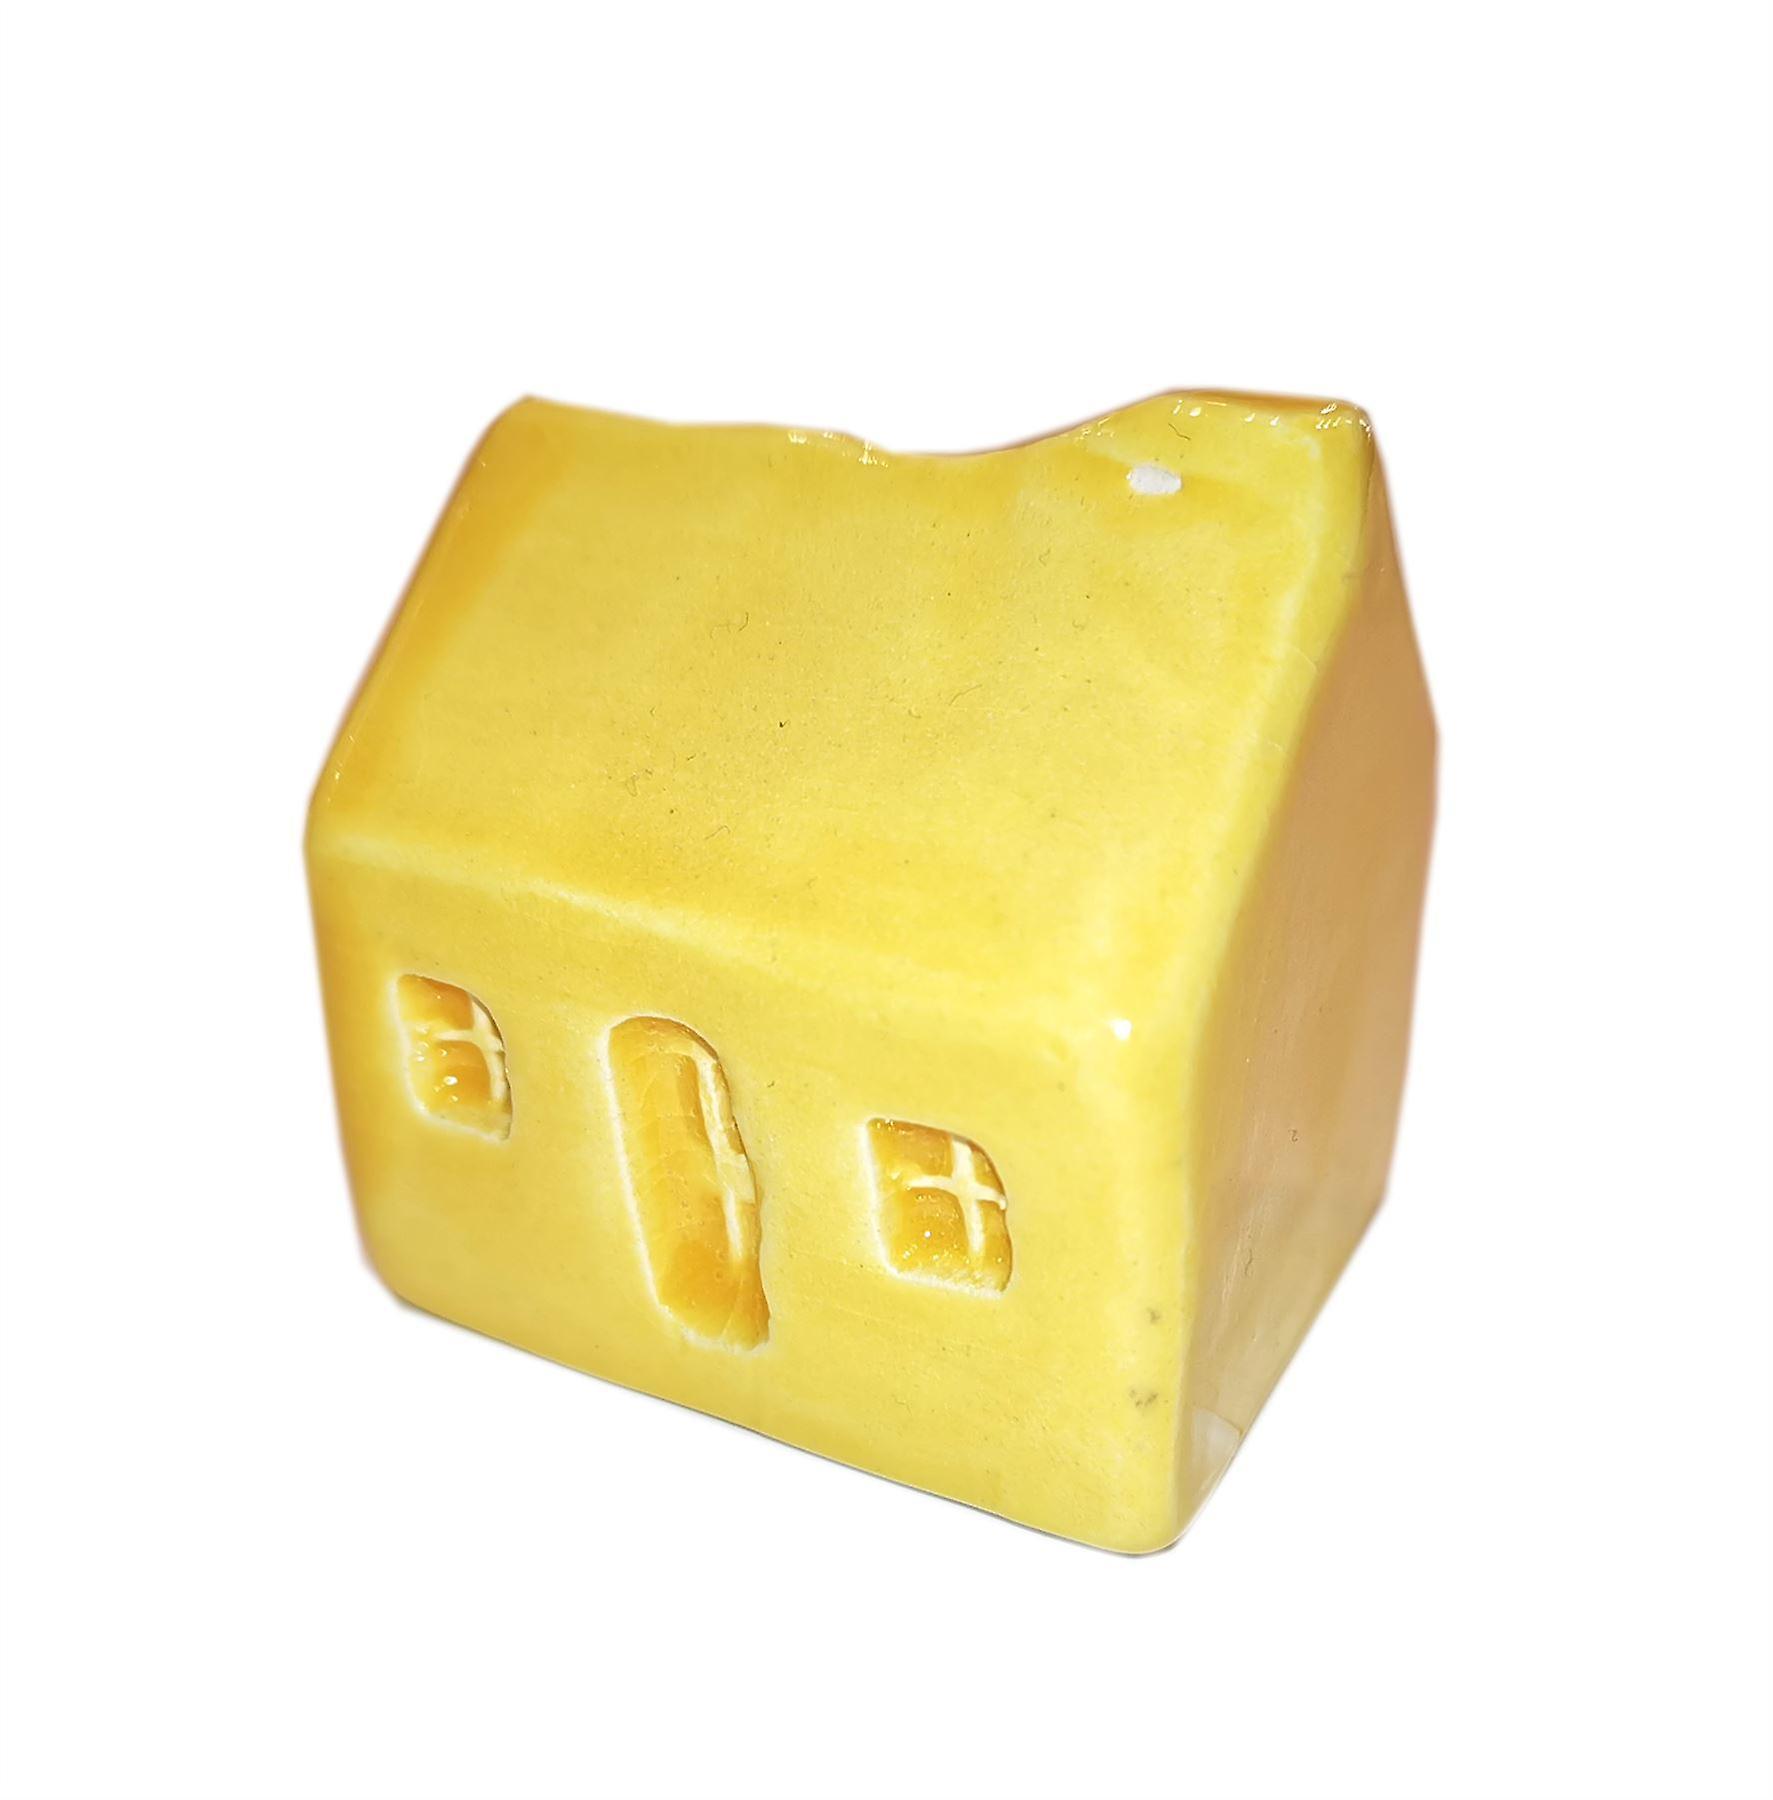 Glenshee Pottery Original Wee Highland Bothy Yellow